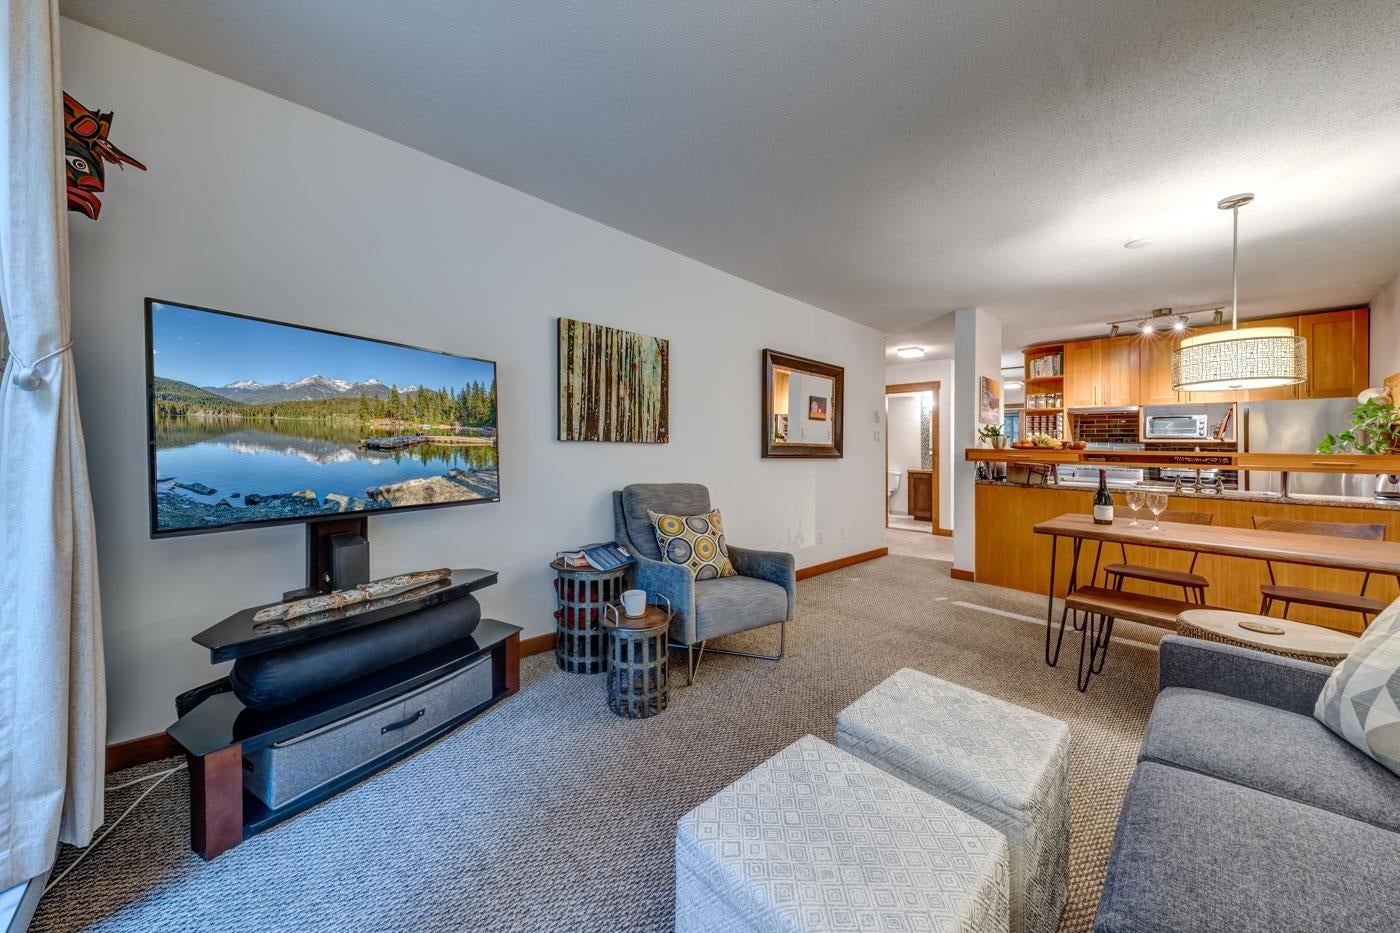 206 2007 NORDIC PLACE - Nordic Apartment/Condo for sale, 1 Bedroom (R2625192)